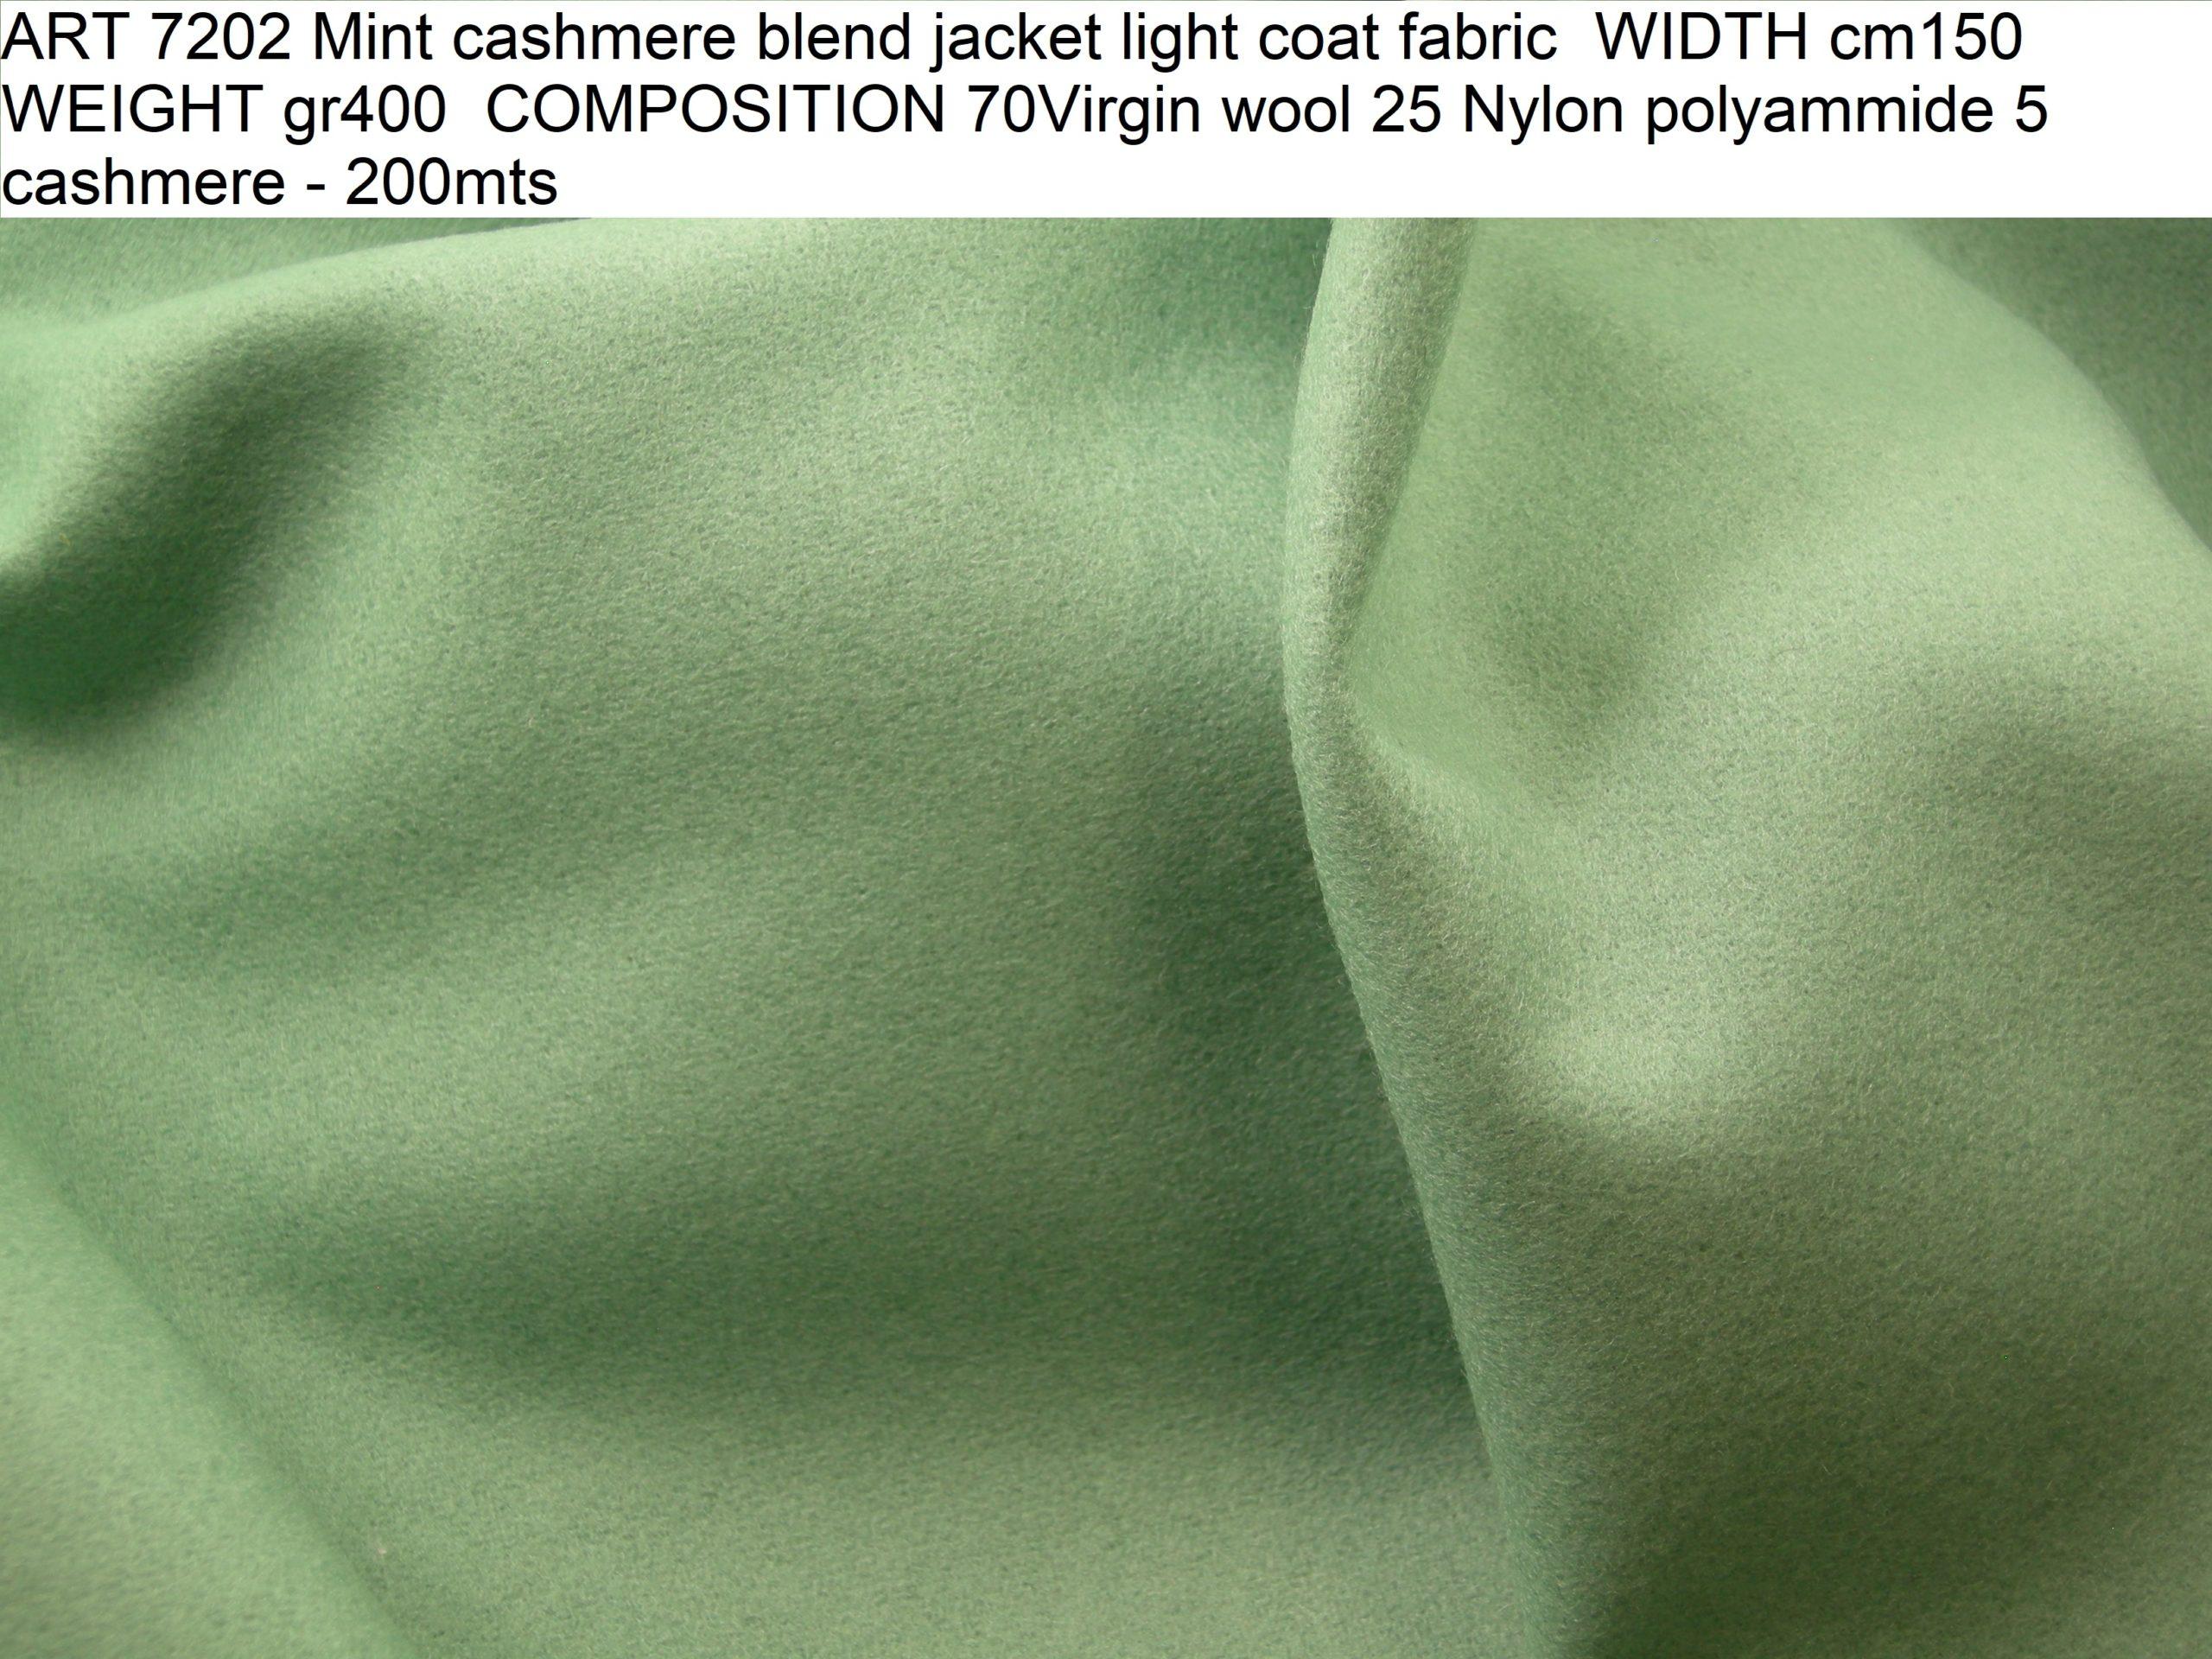 ART 7202 Mint cashmere blend jacket light coat fabric WIDTH cm150 WEIGHT gr400 COMPOSITION 70Virgin wool 25 Nylon polyammide 5 cashmere - 200mts